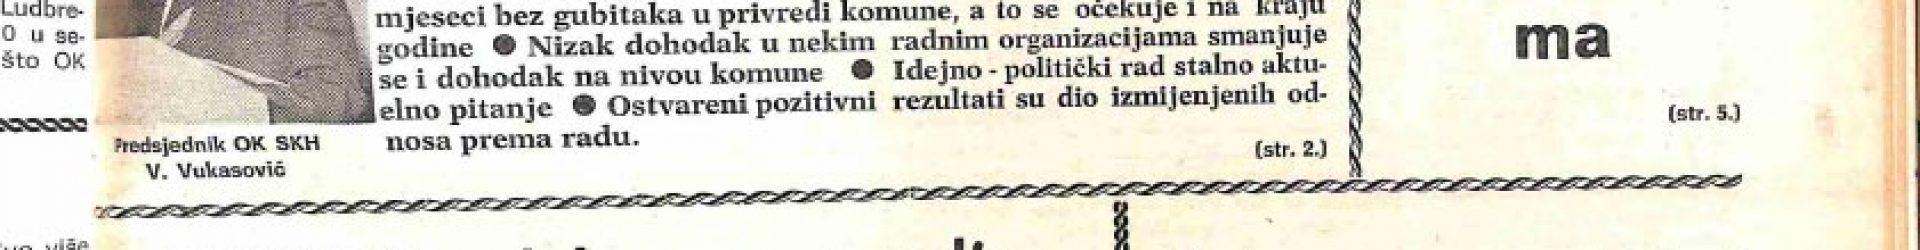 14 studeni 1978